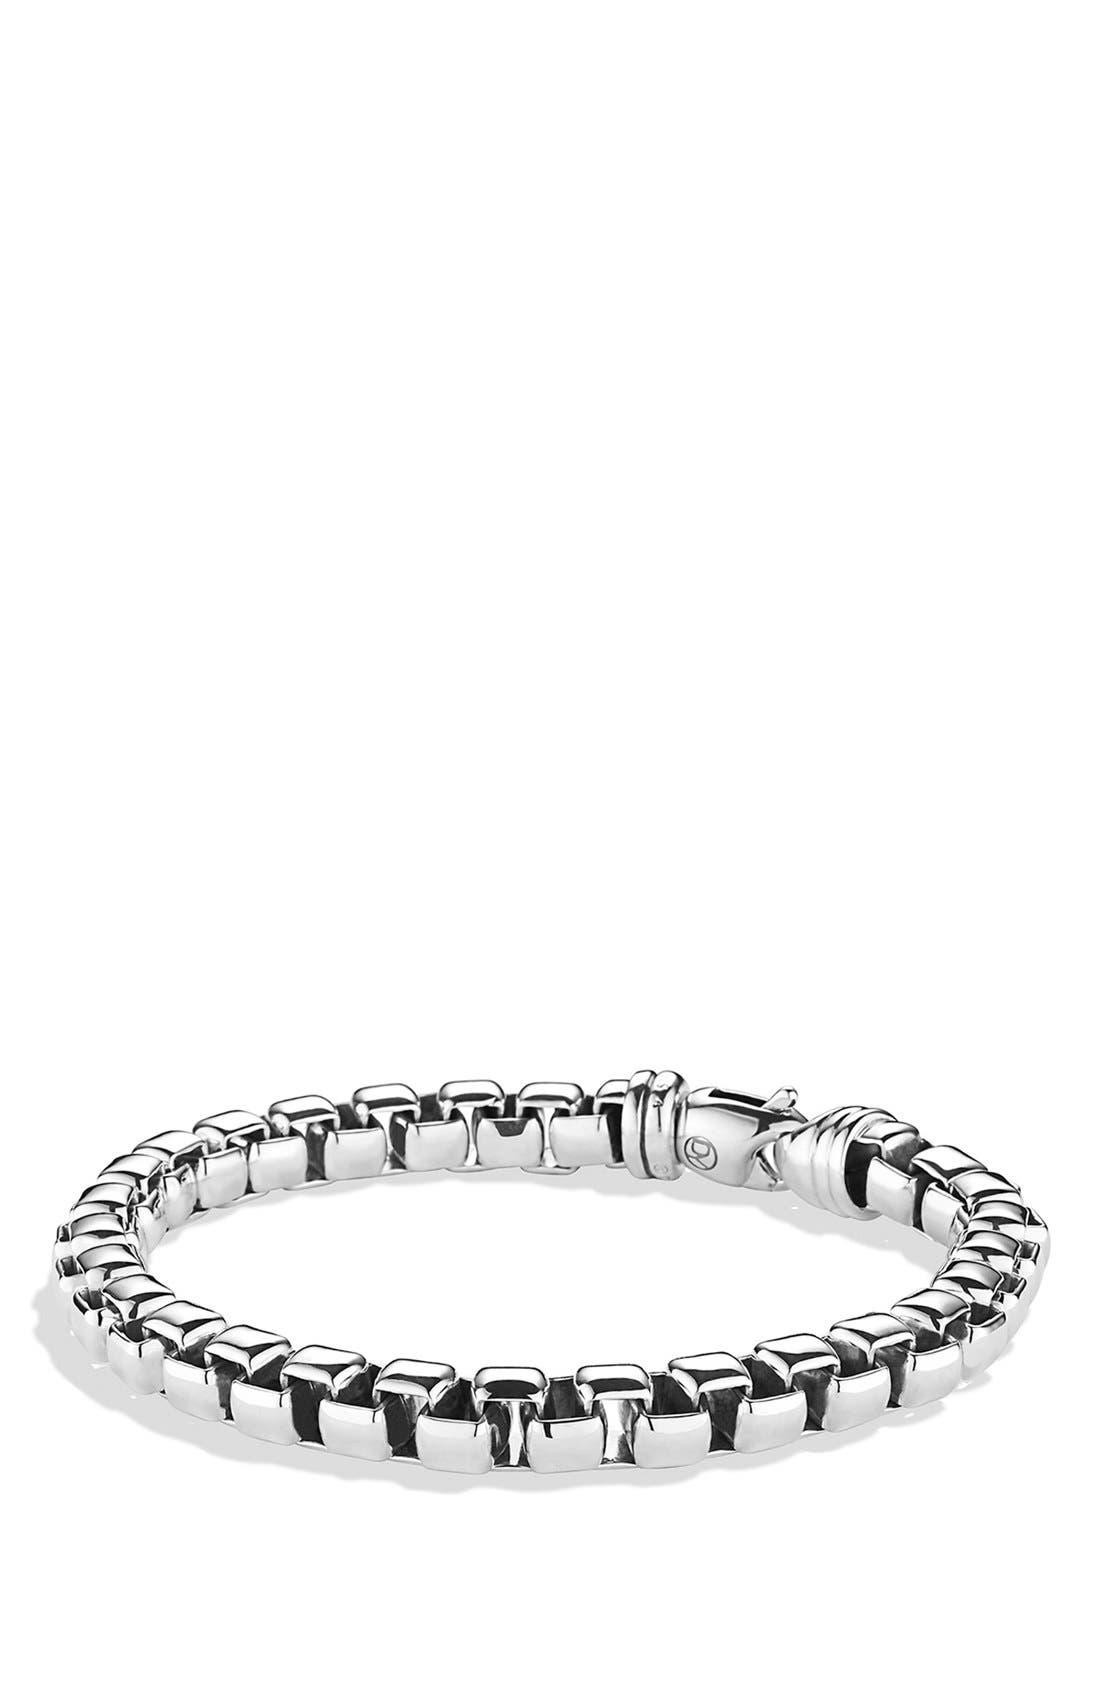 Main Image - David Yurman Extra-Large Box Chain Bracelet